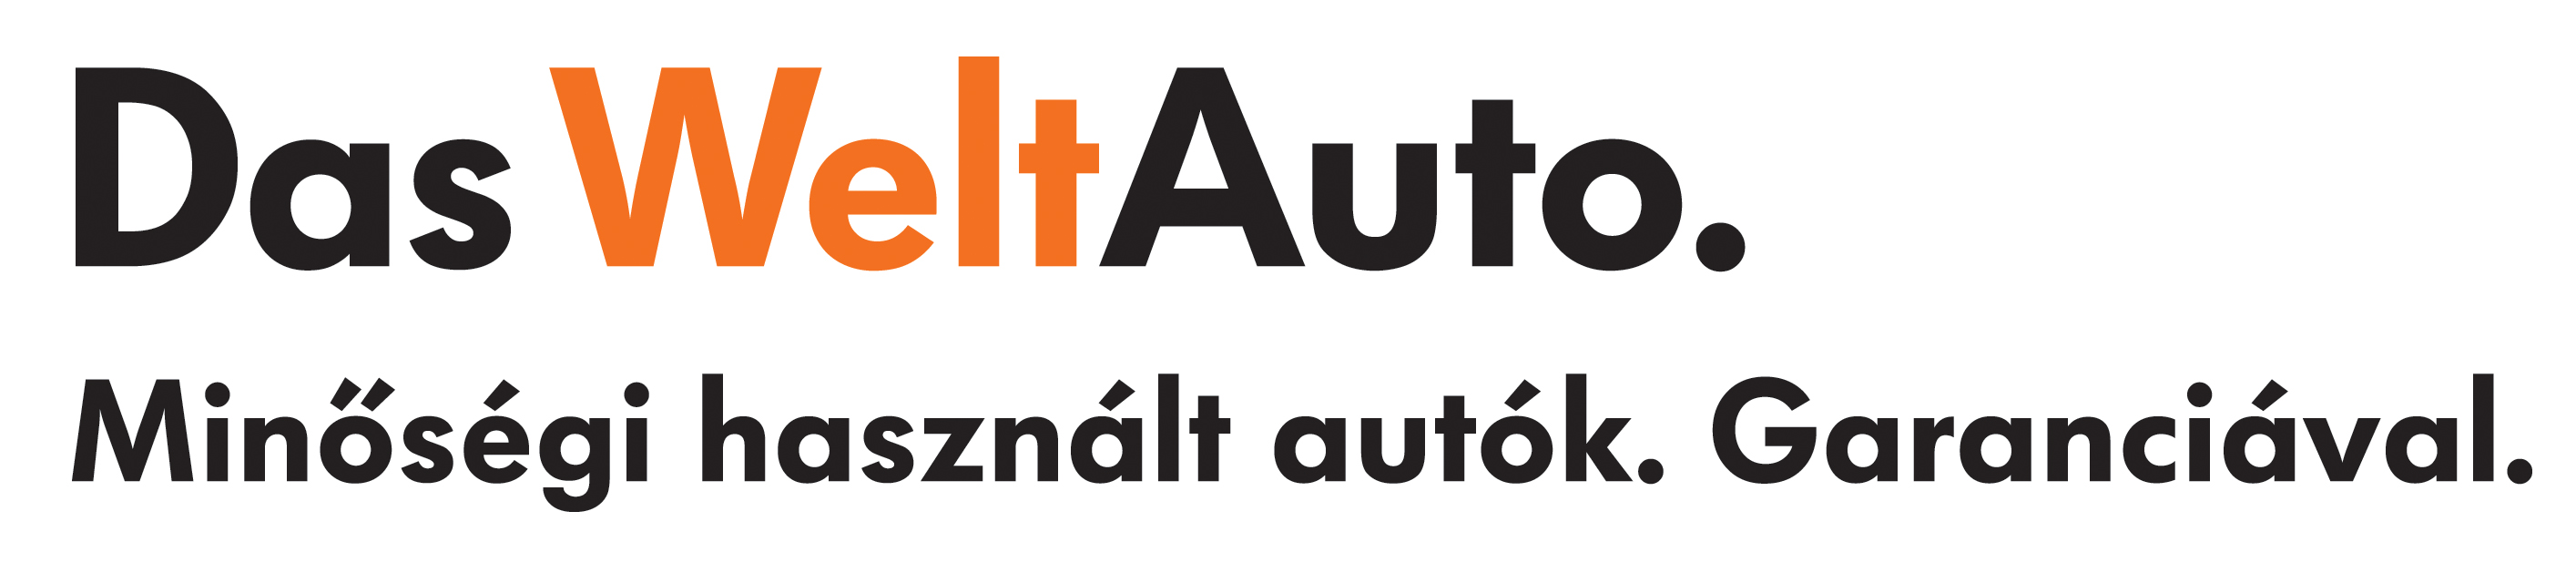 dasweltauto_logo.jpg